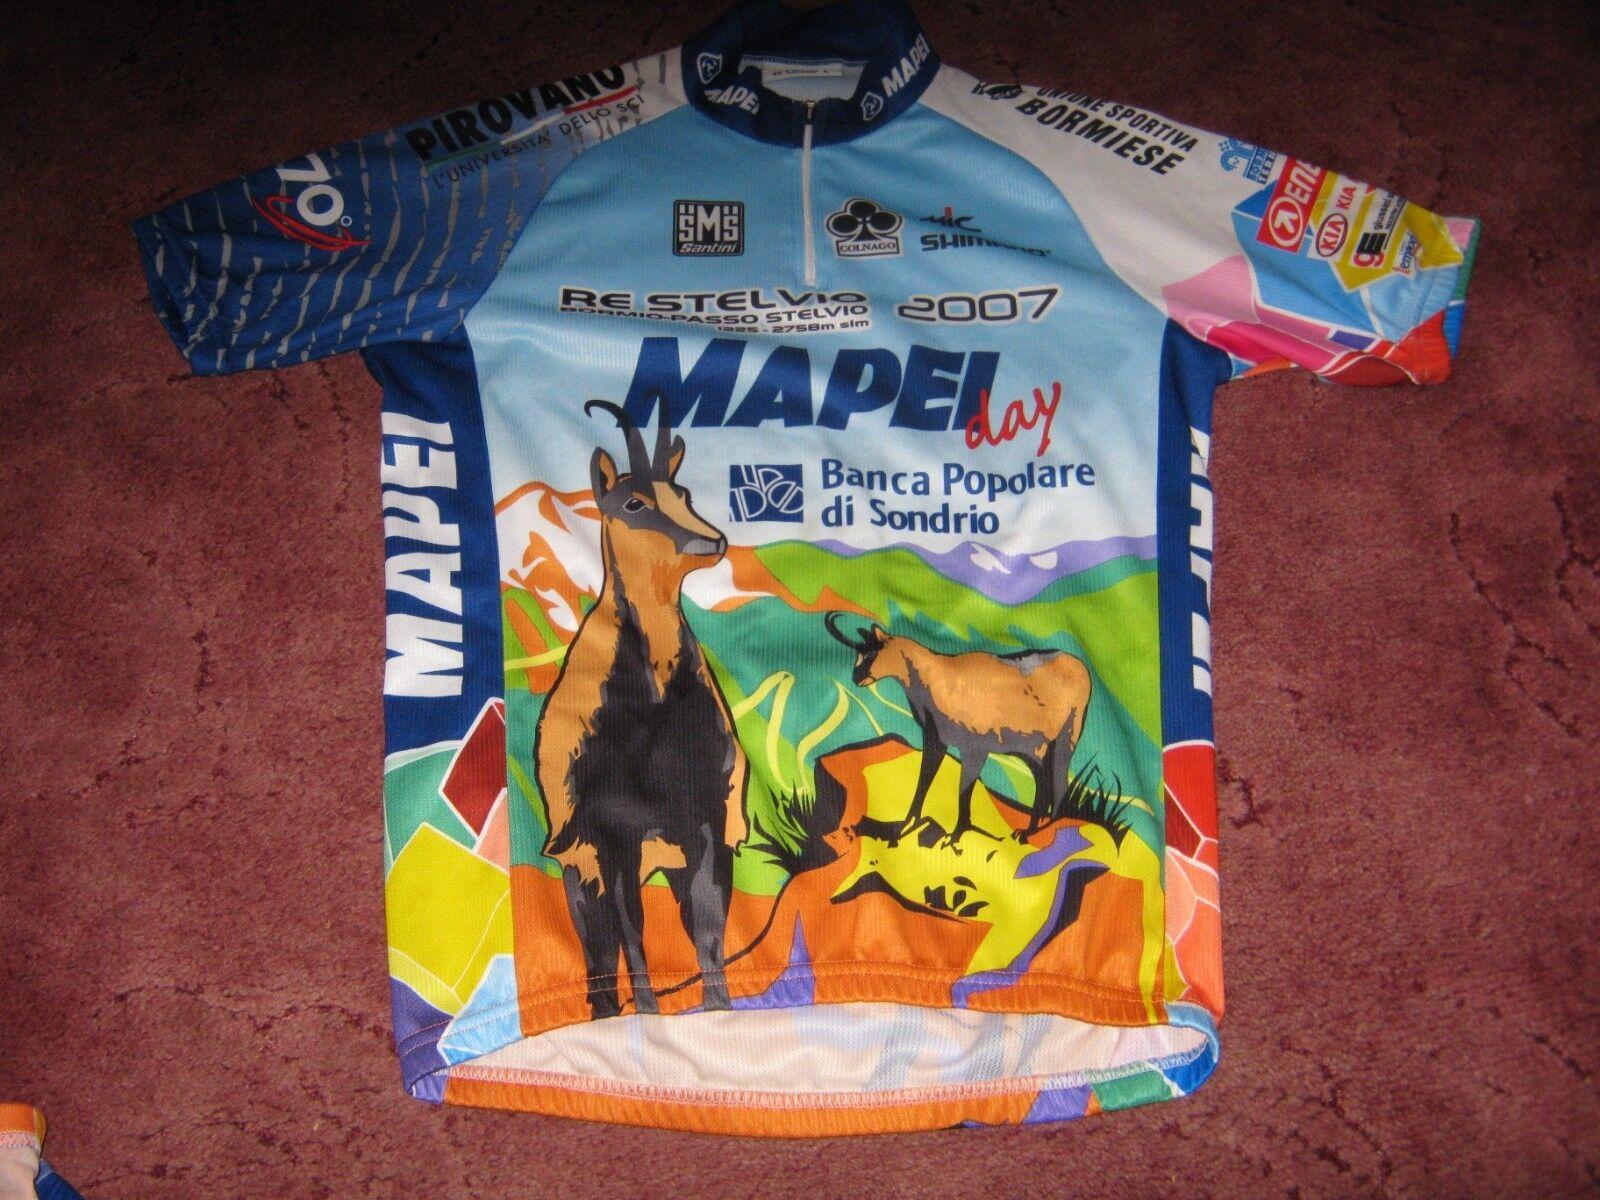 Mapei Day 2007 Santini Italian  cycling jersey Sz  48 L  quality guaranteed